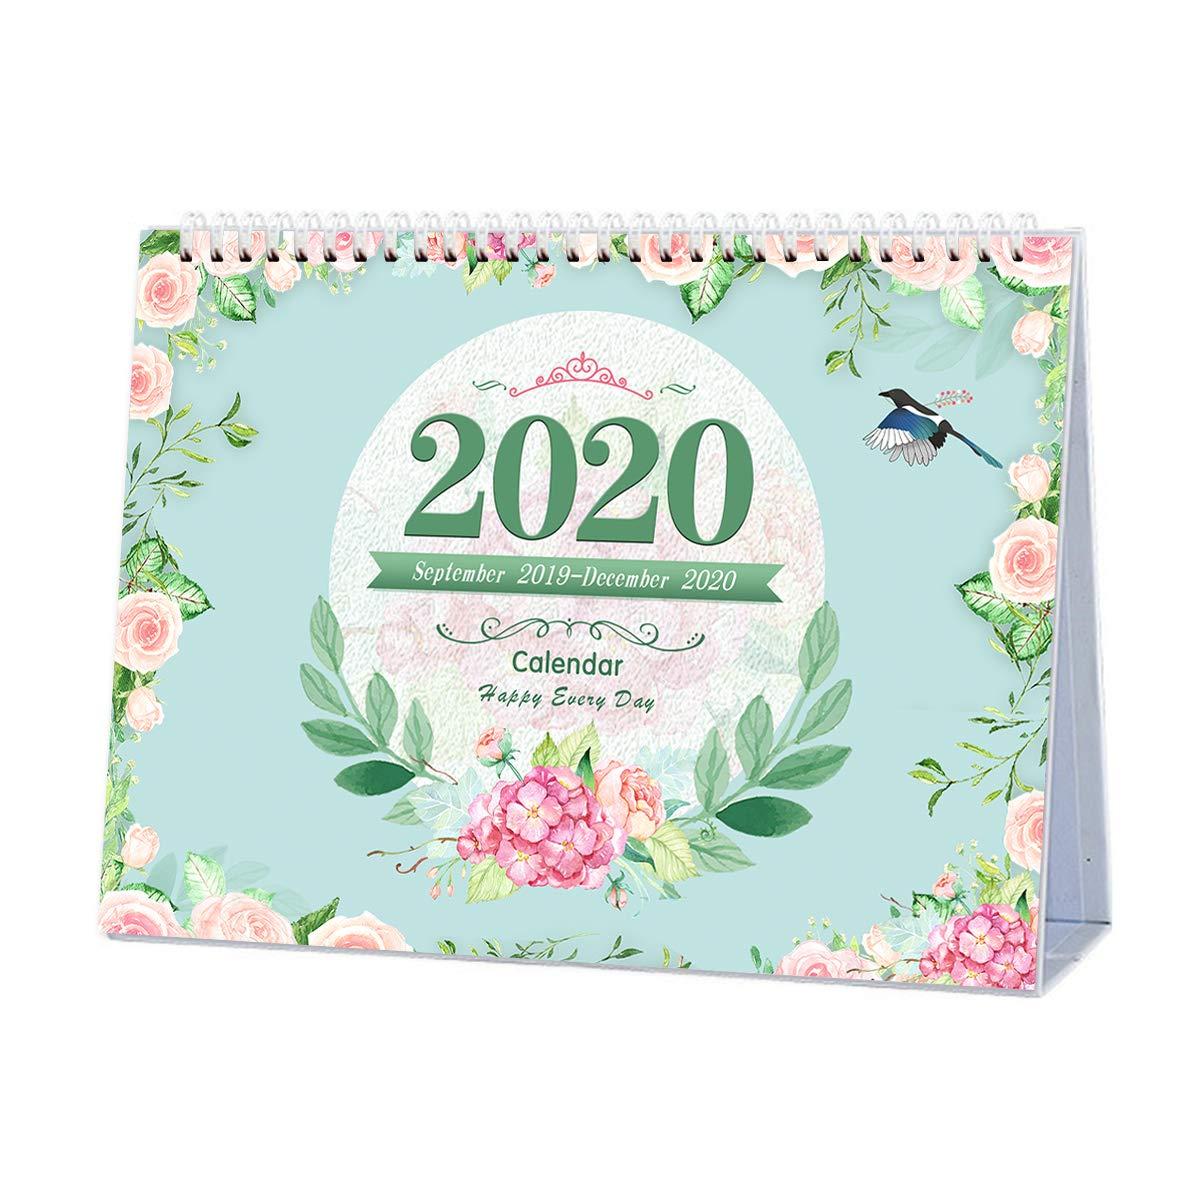 September 2019 to December 2020 Desk Monthly Calendar with Stand, Desktop Calendar Monthly Planner Daily Calendar Planner for School, Classroom, Home Use